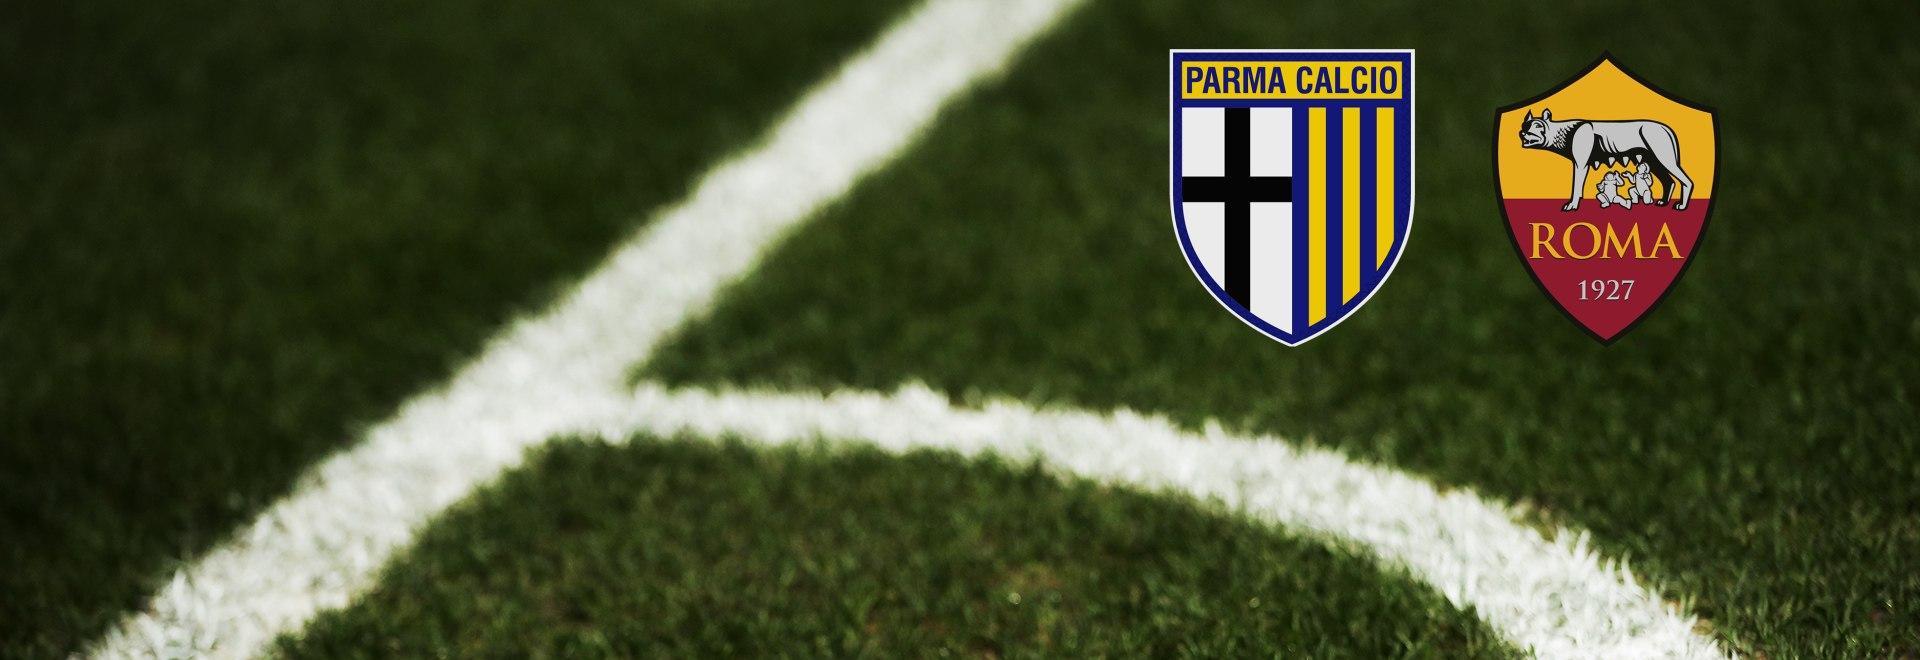 Parma - Roma. 27a g.